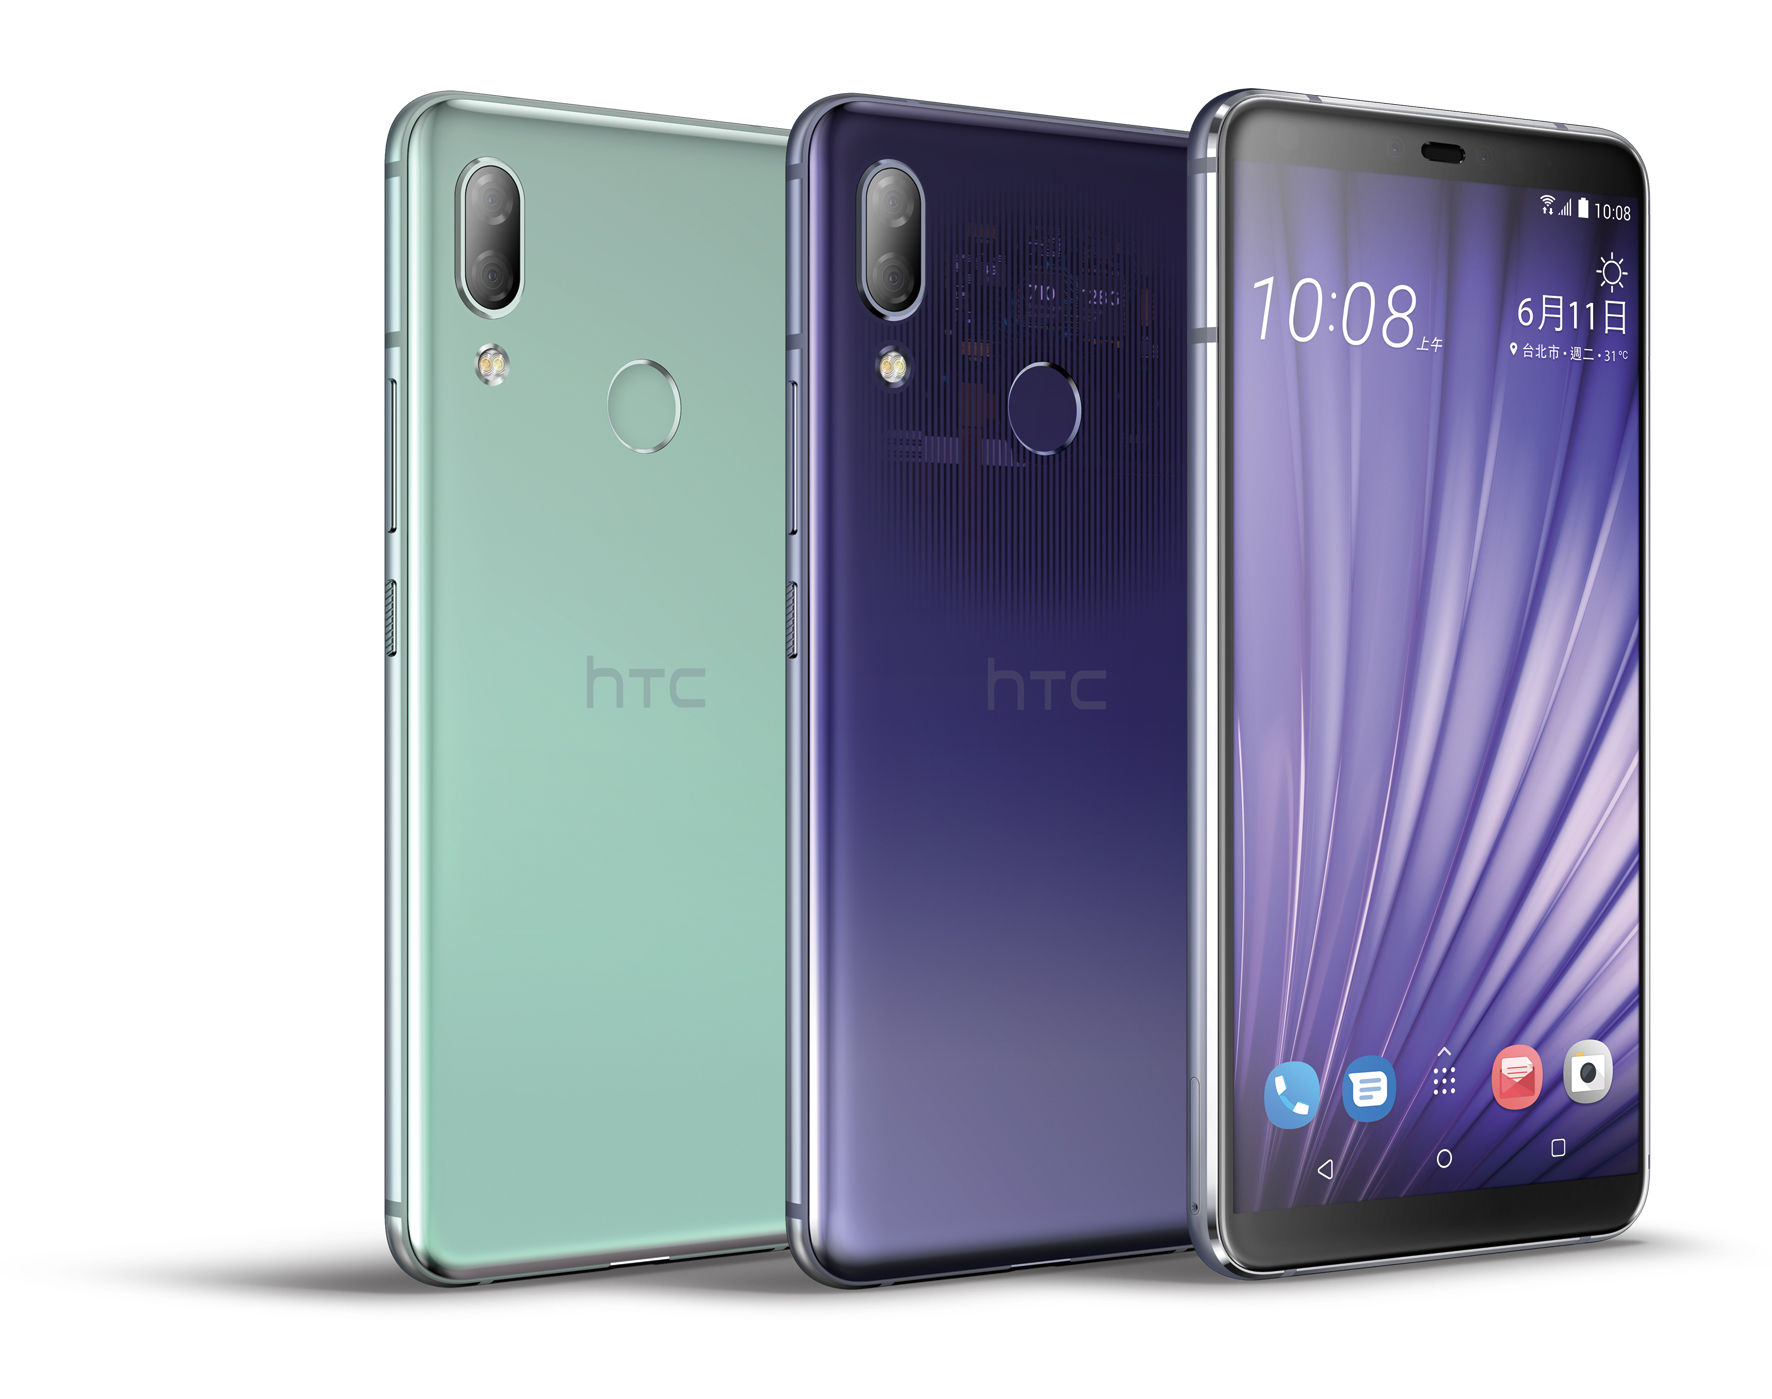 HTC 推出中高端手机 U19e 和入门级新品 Desire 19+